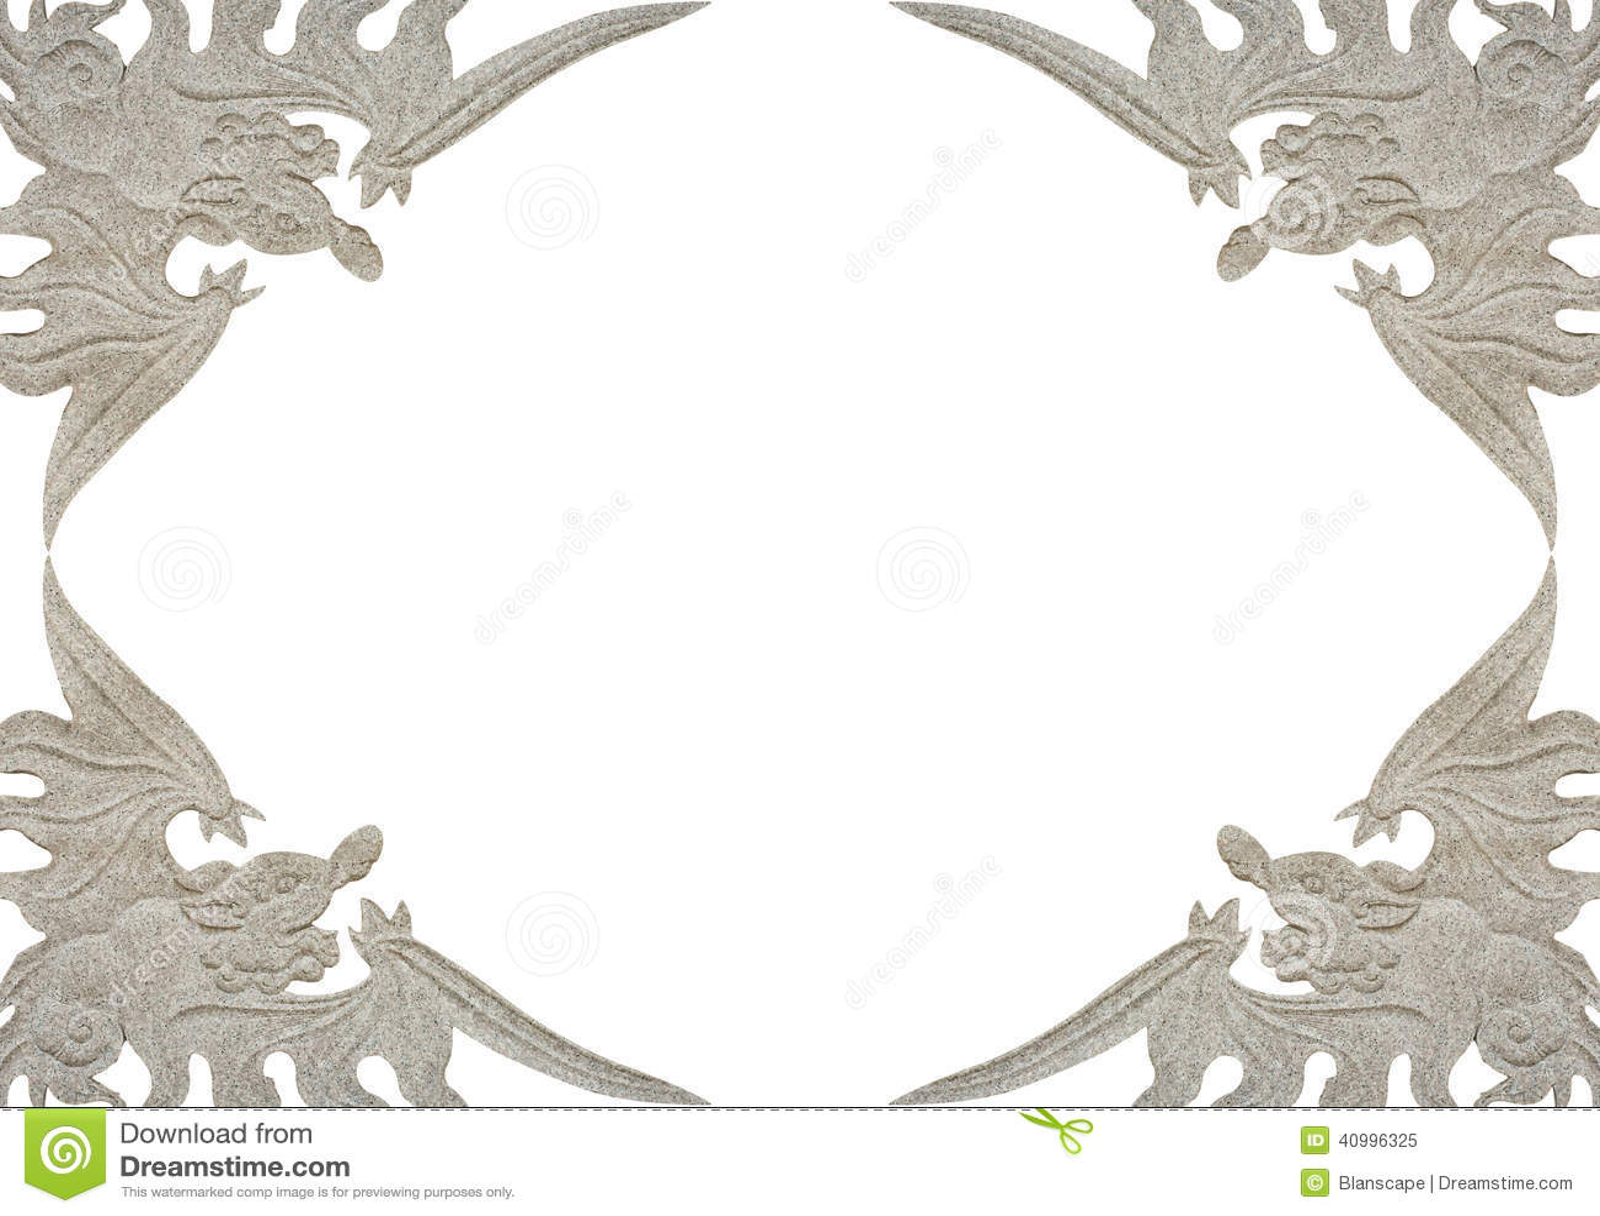 Antique Dragon Frame Isolated On White Stock Image - Image of ...